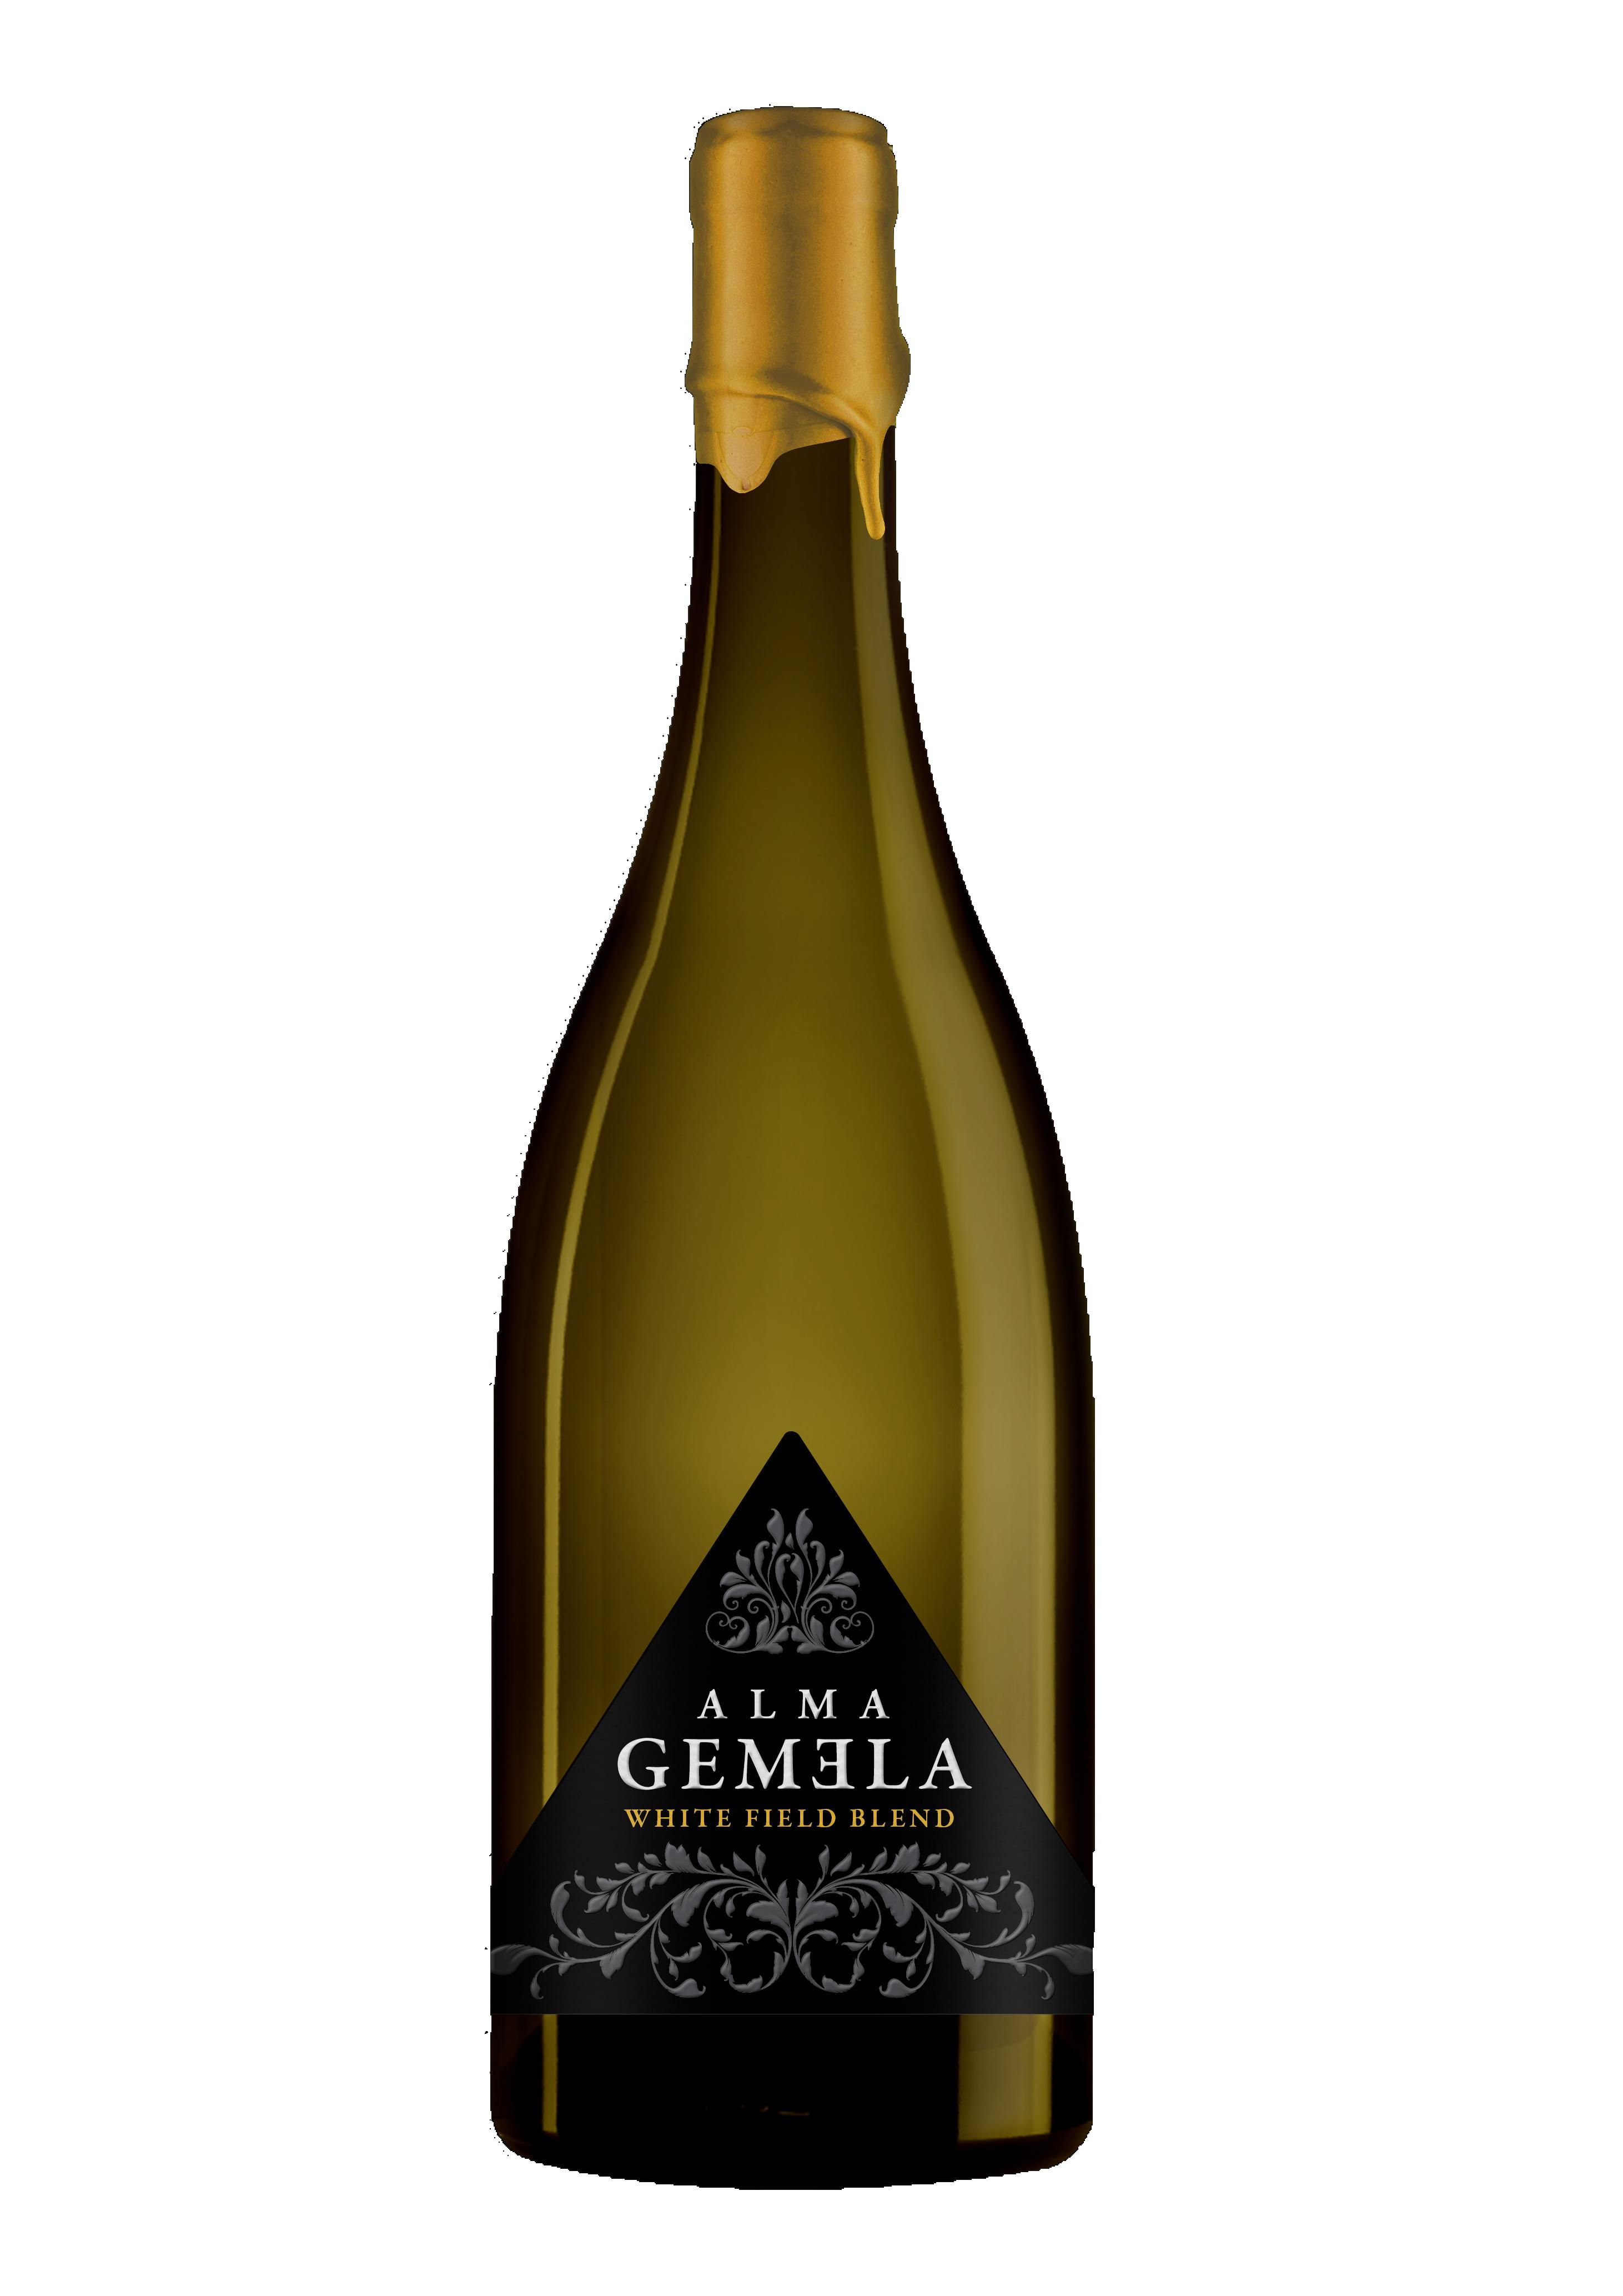 Alma Gemela White Field Blend